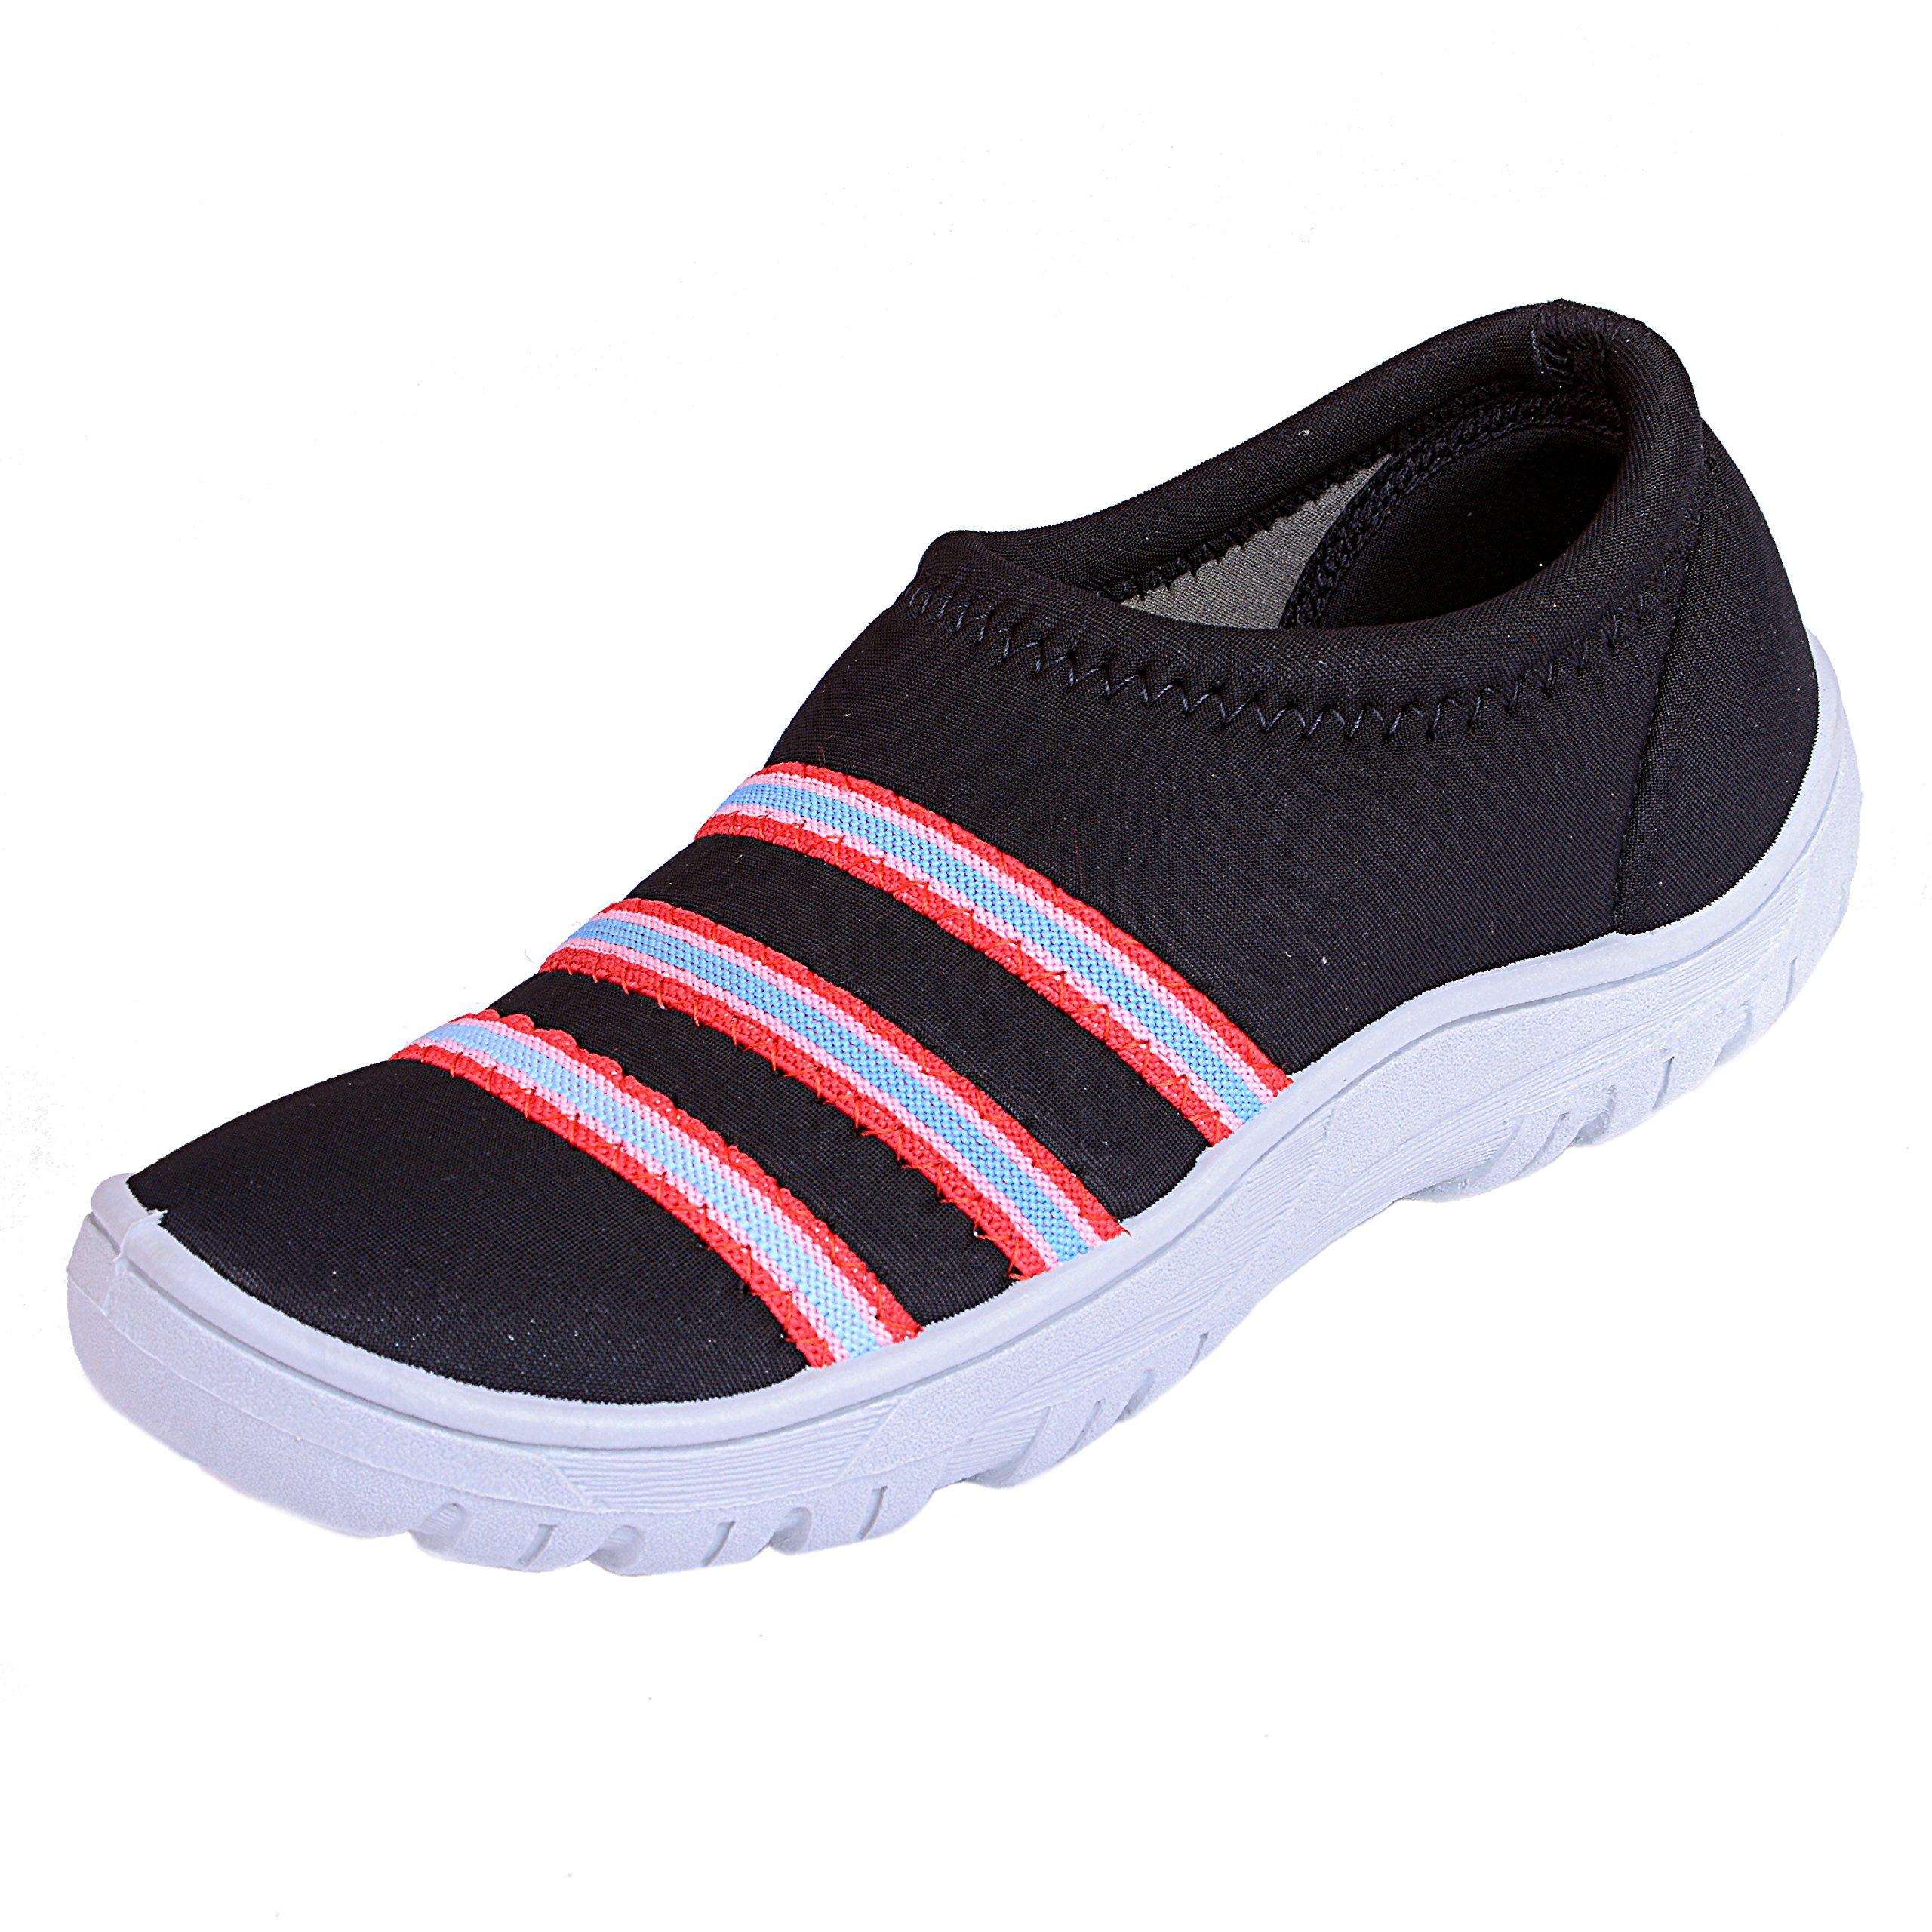 Liberty Women Supreme Comfort Shoes Black